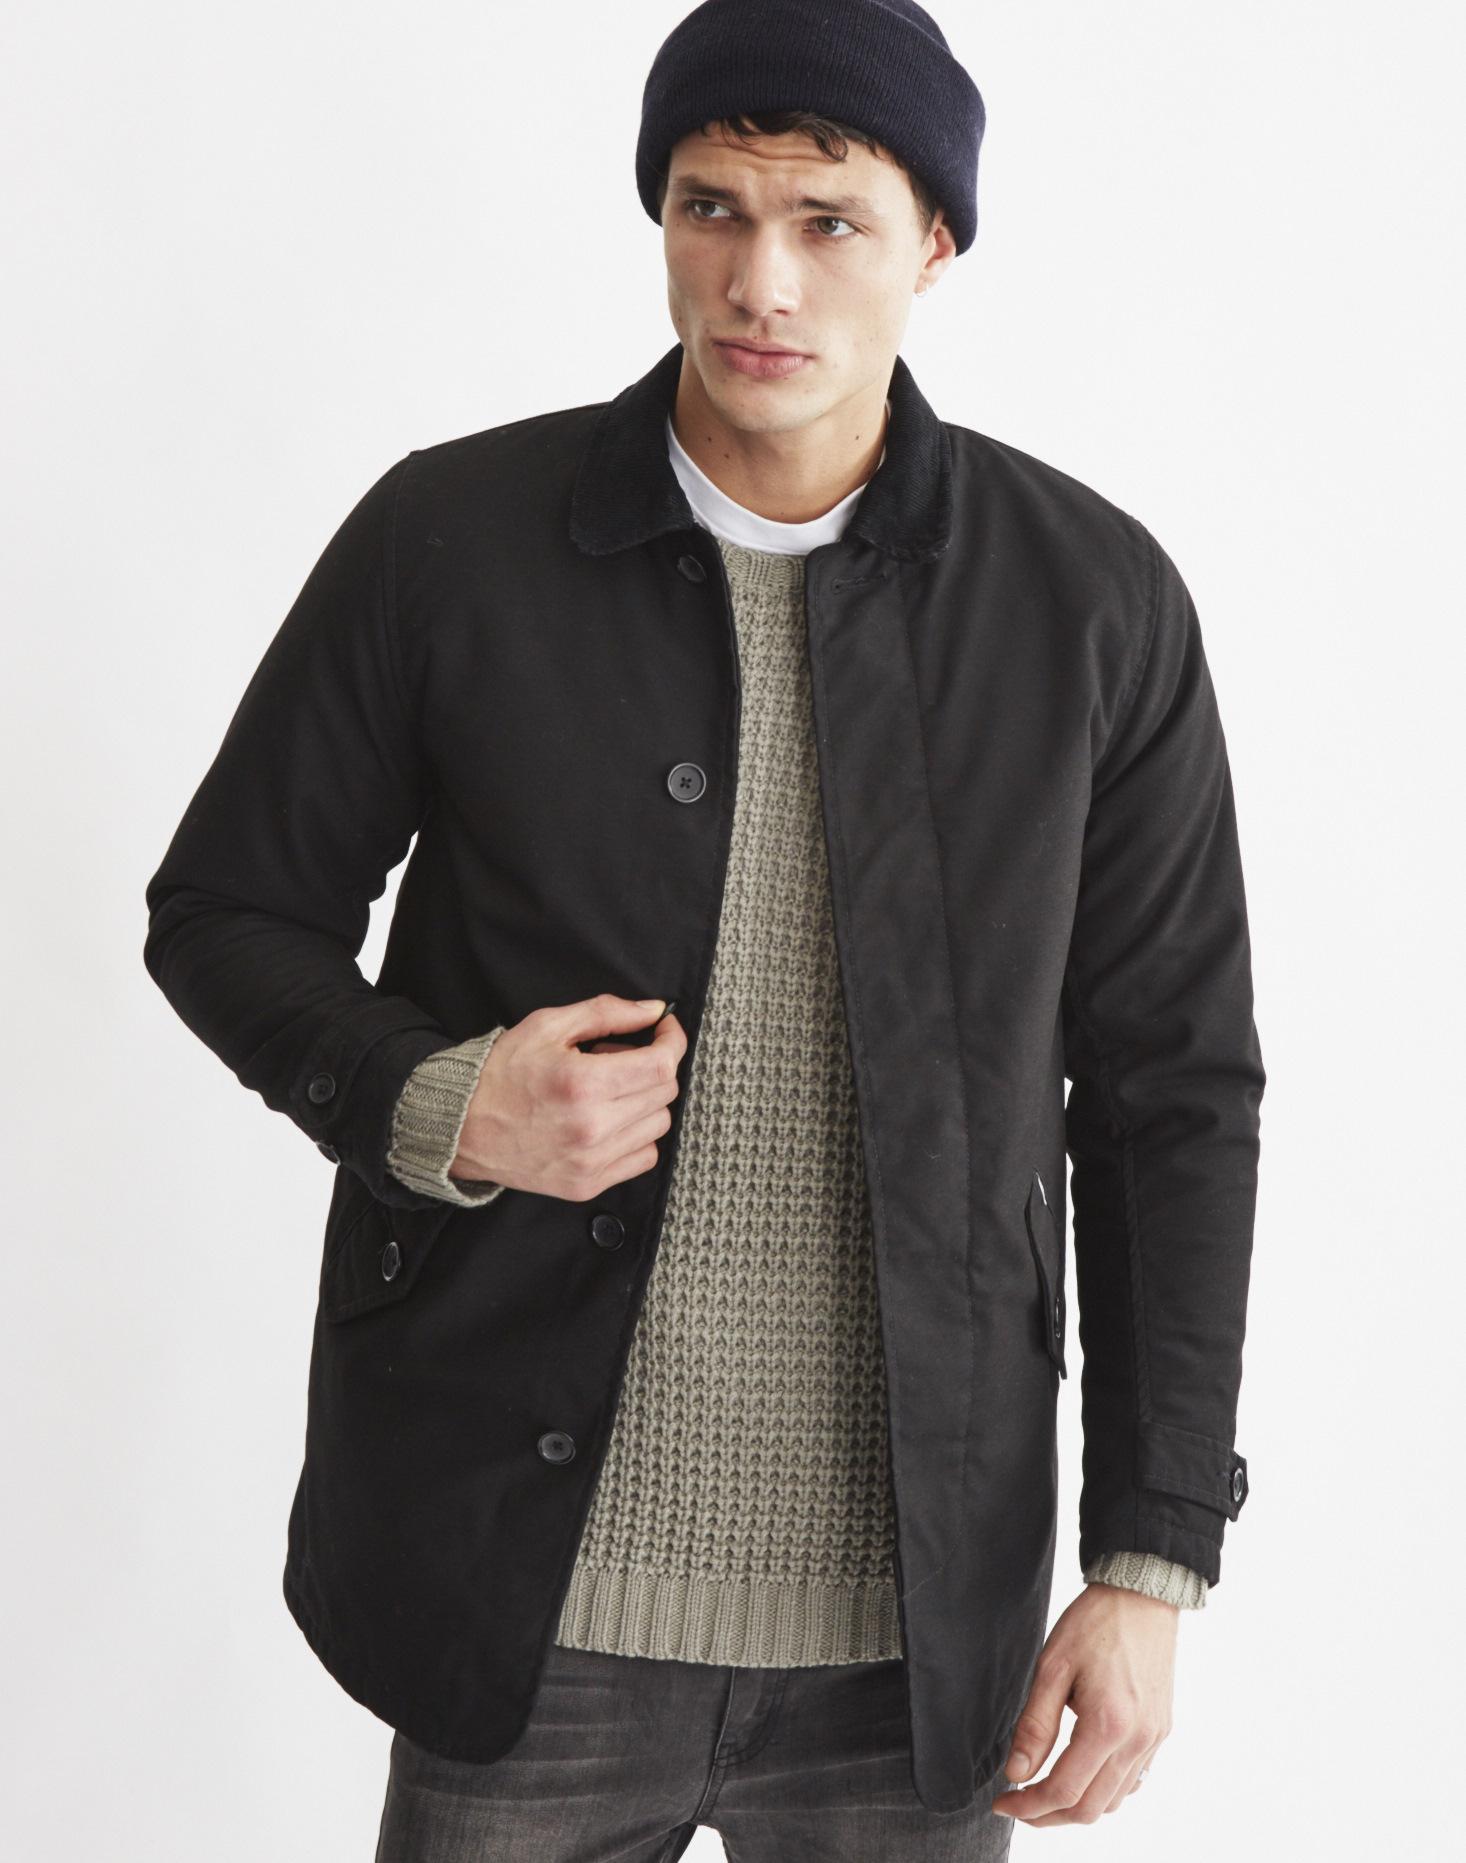 Lyst Carhartt Wip Harris Trench Coat Black In Black For Men